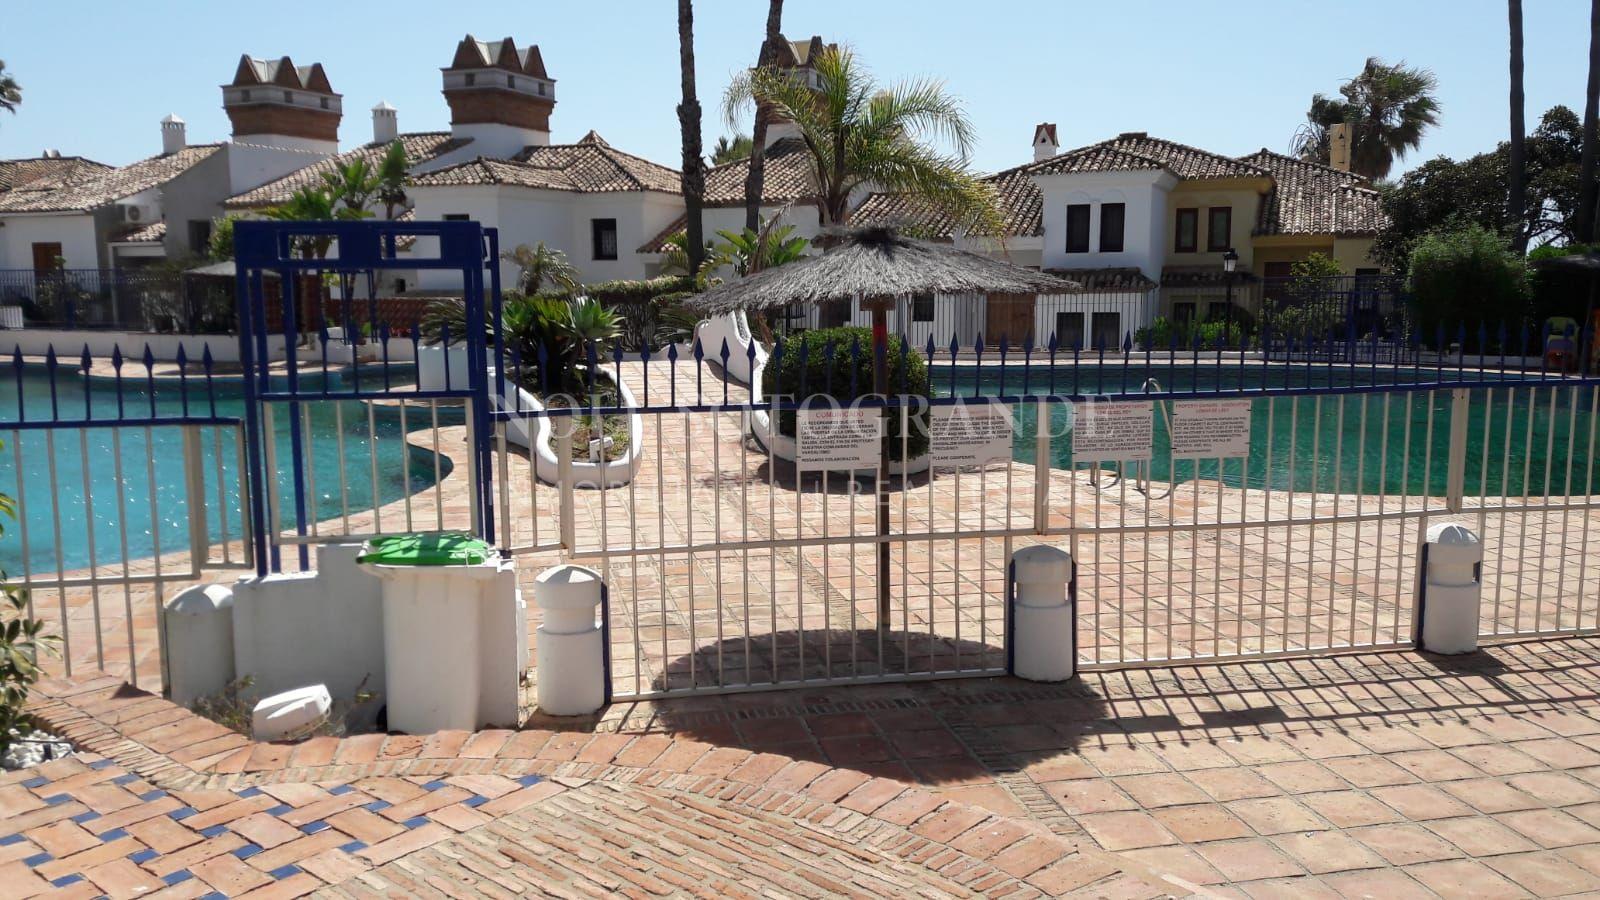 Loma Del Rey townhouse for sale in Alcaidesa